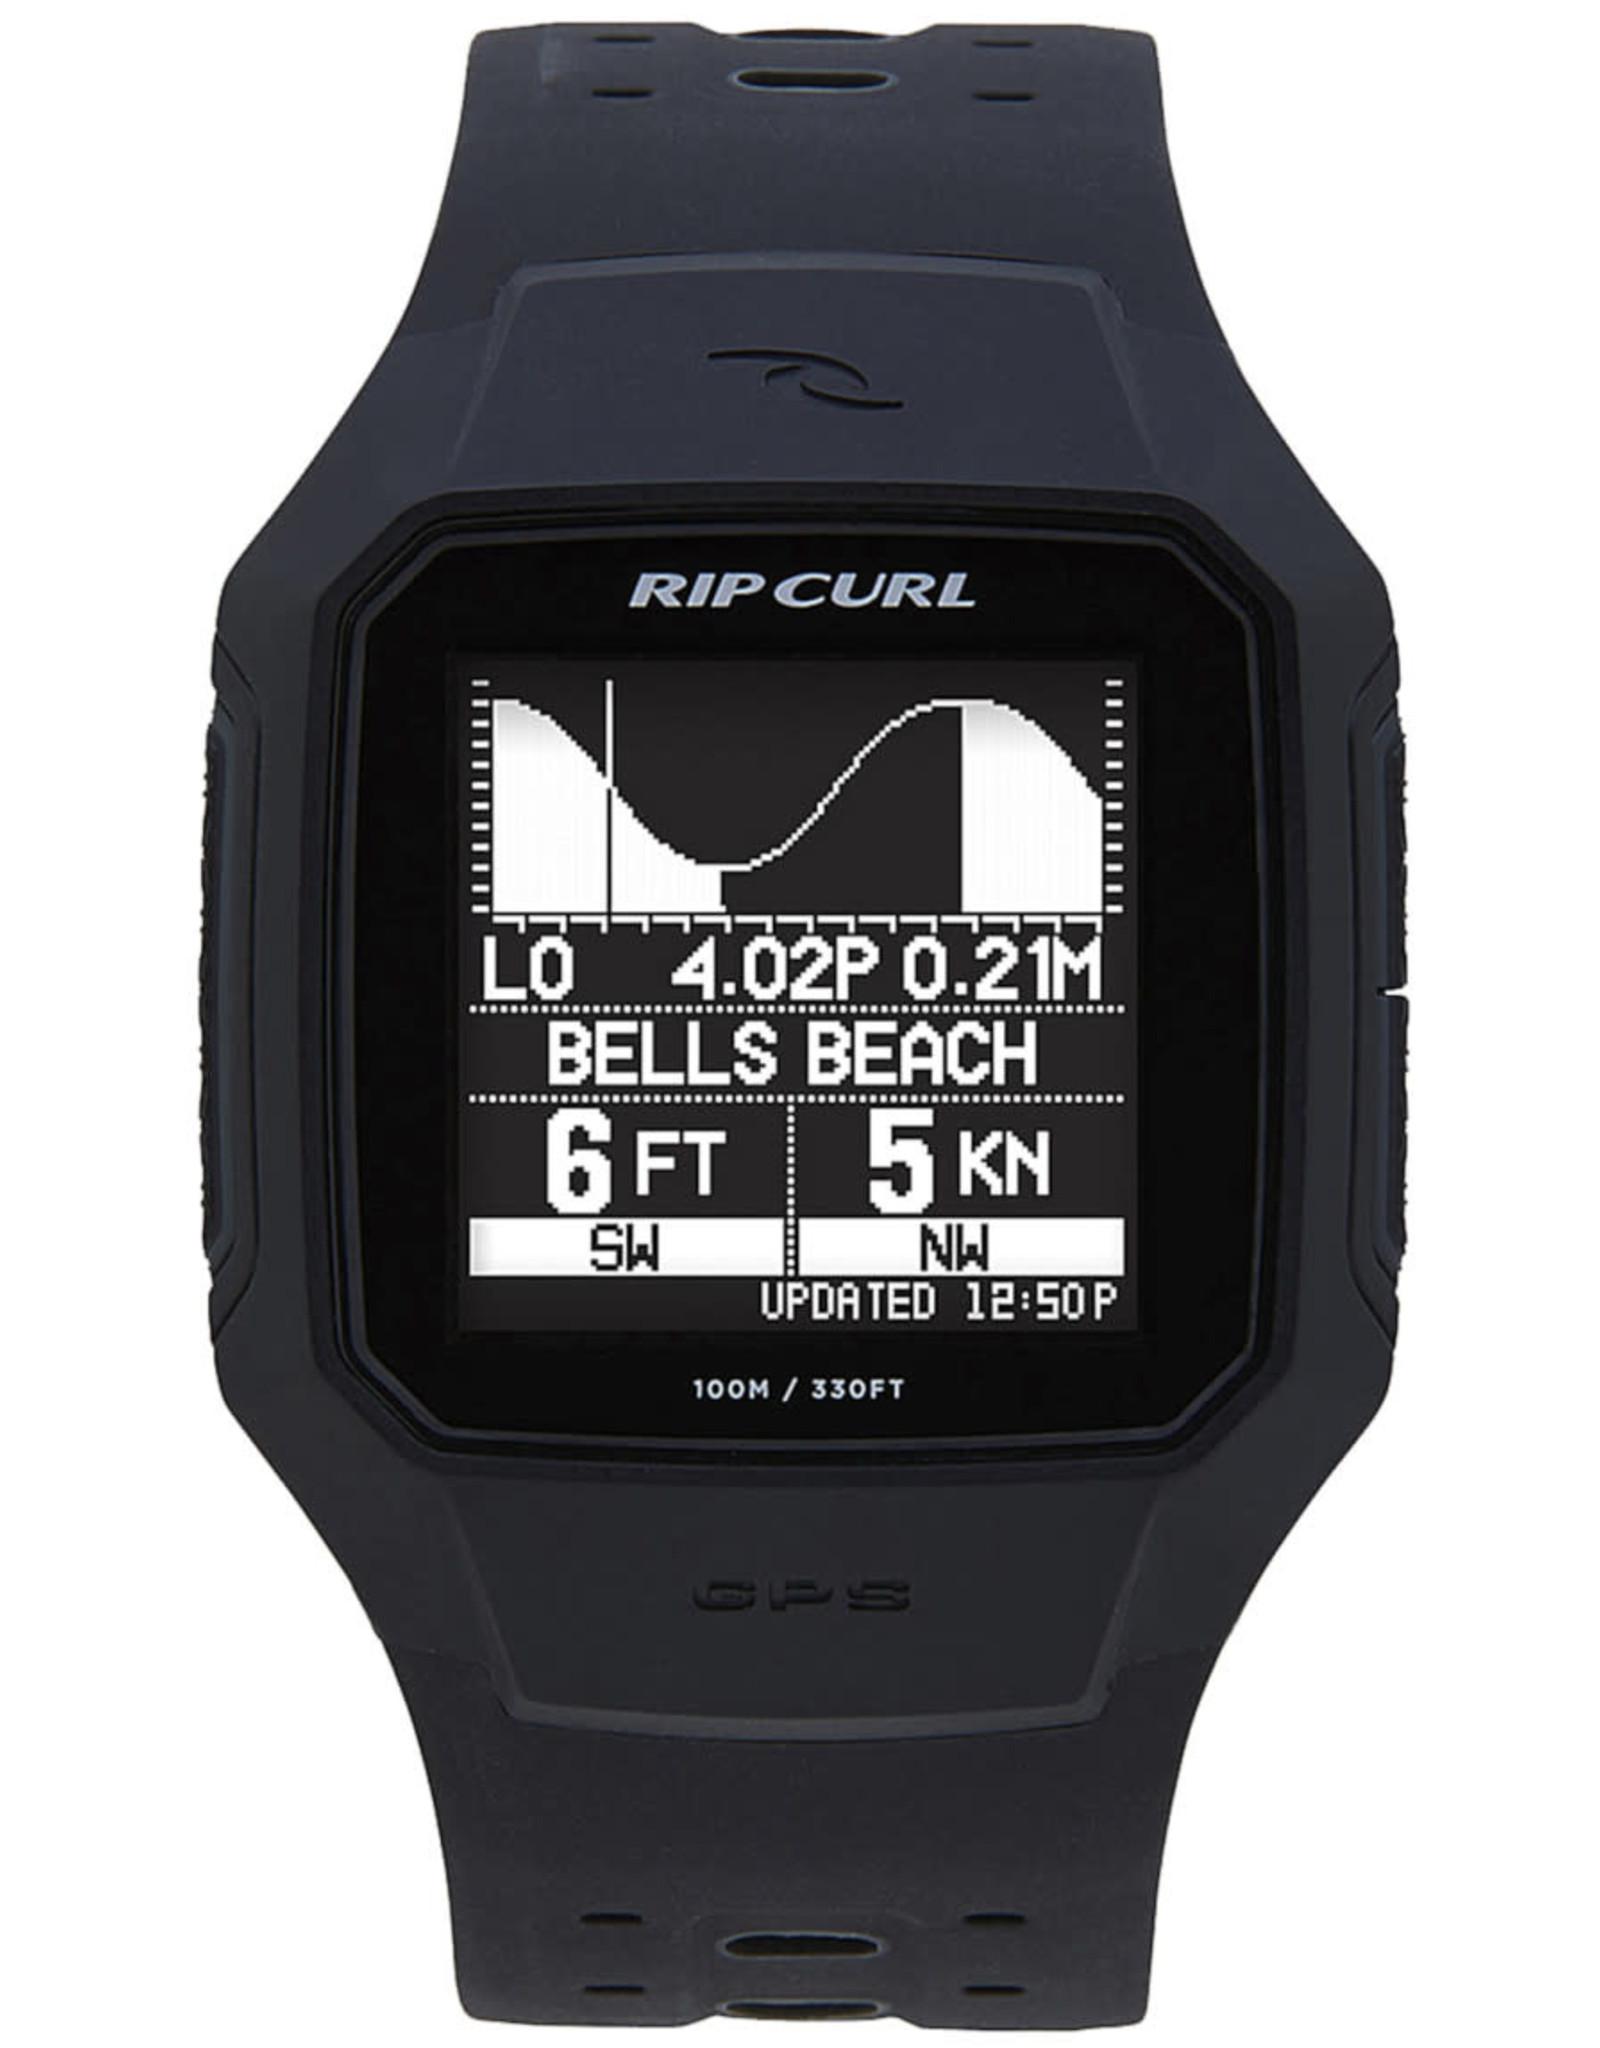 Rip Curl Rip Curl Search Gps Series 2 Watch Black